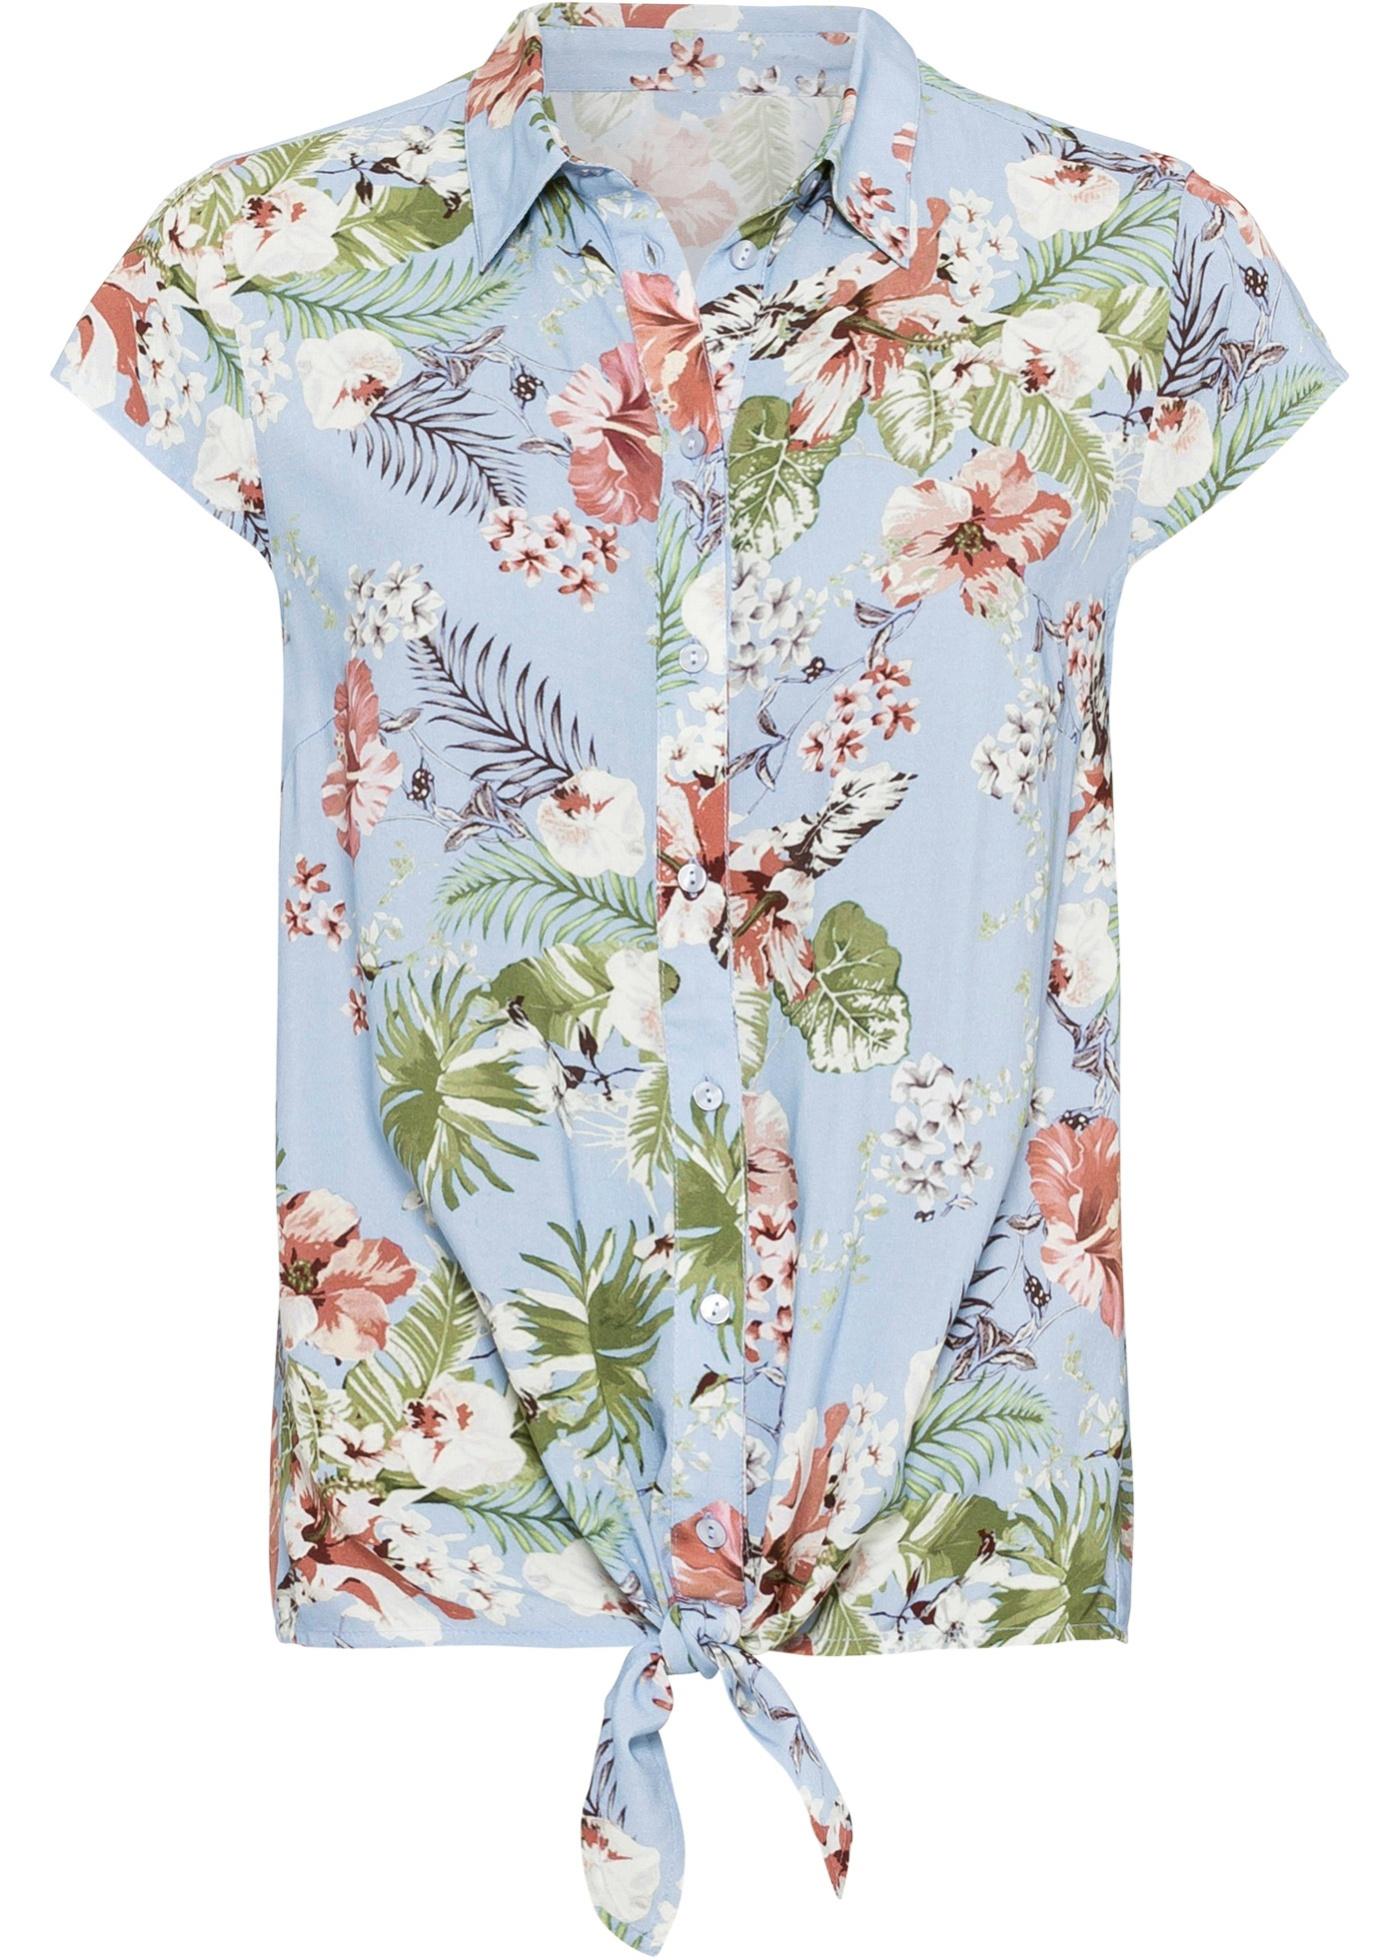 Image of Bedruckte Bluse mit Knotendetail